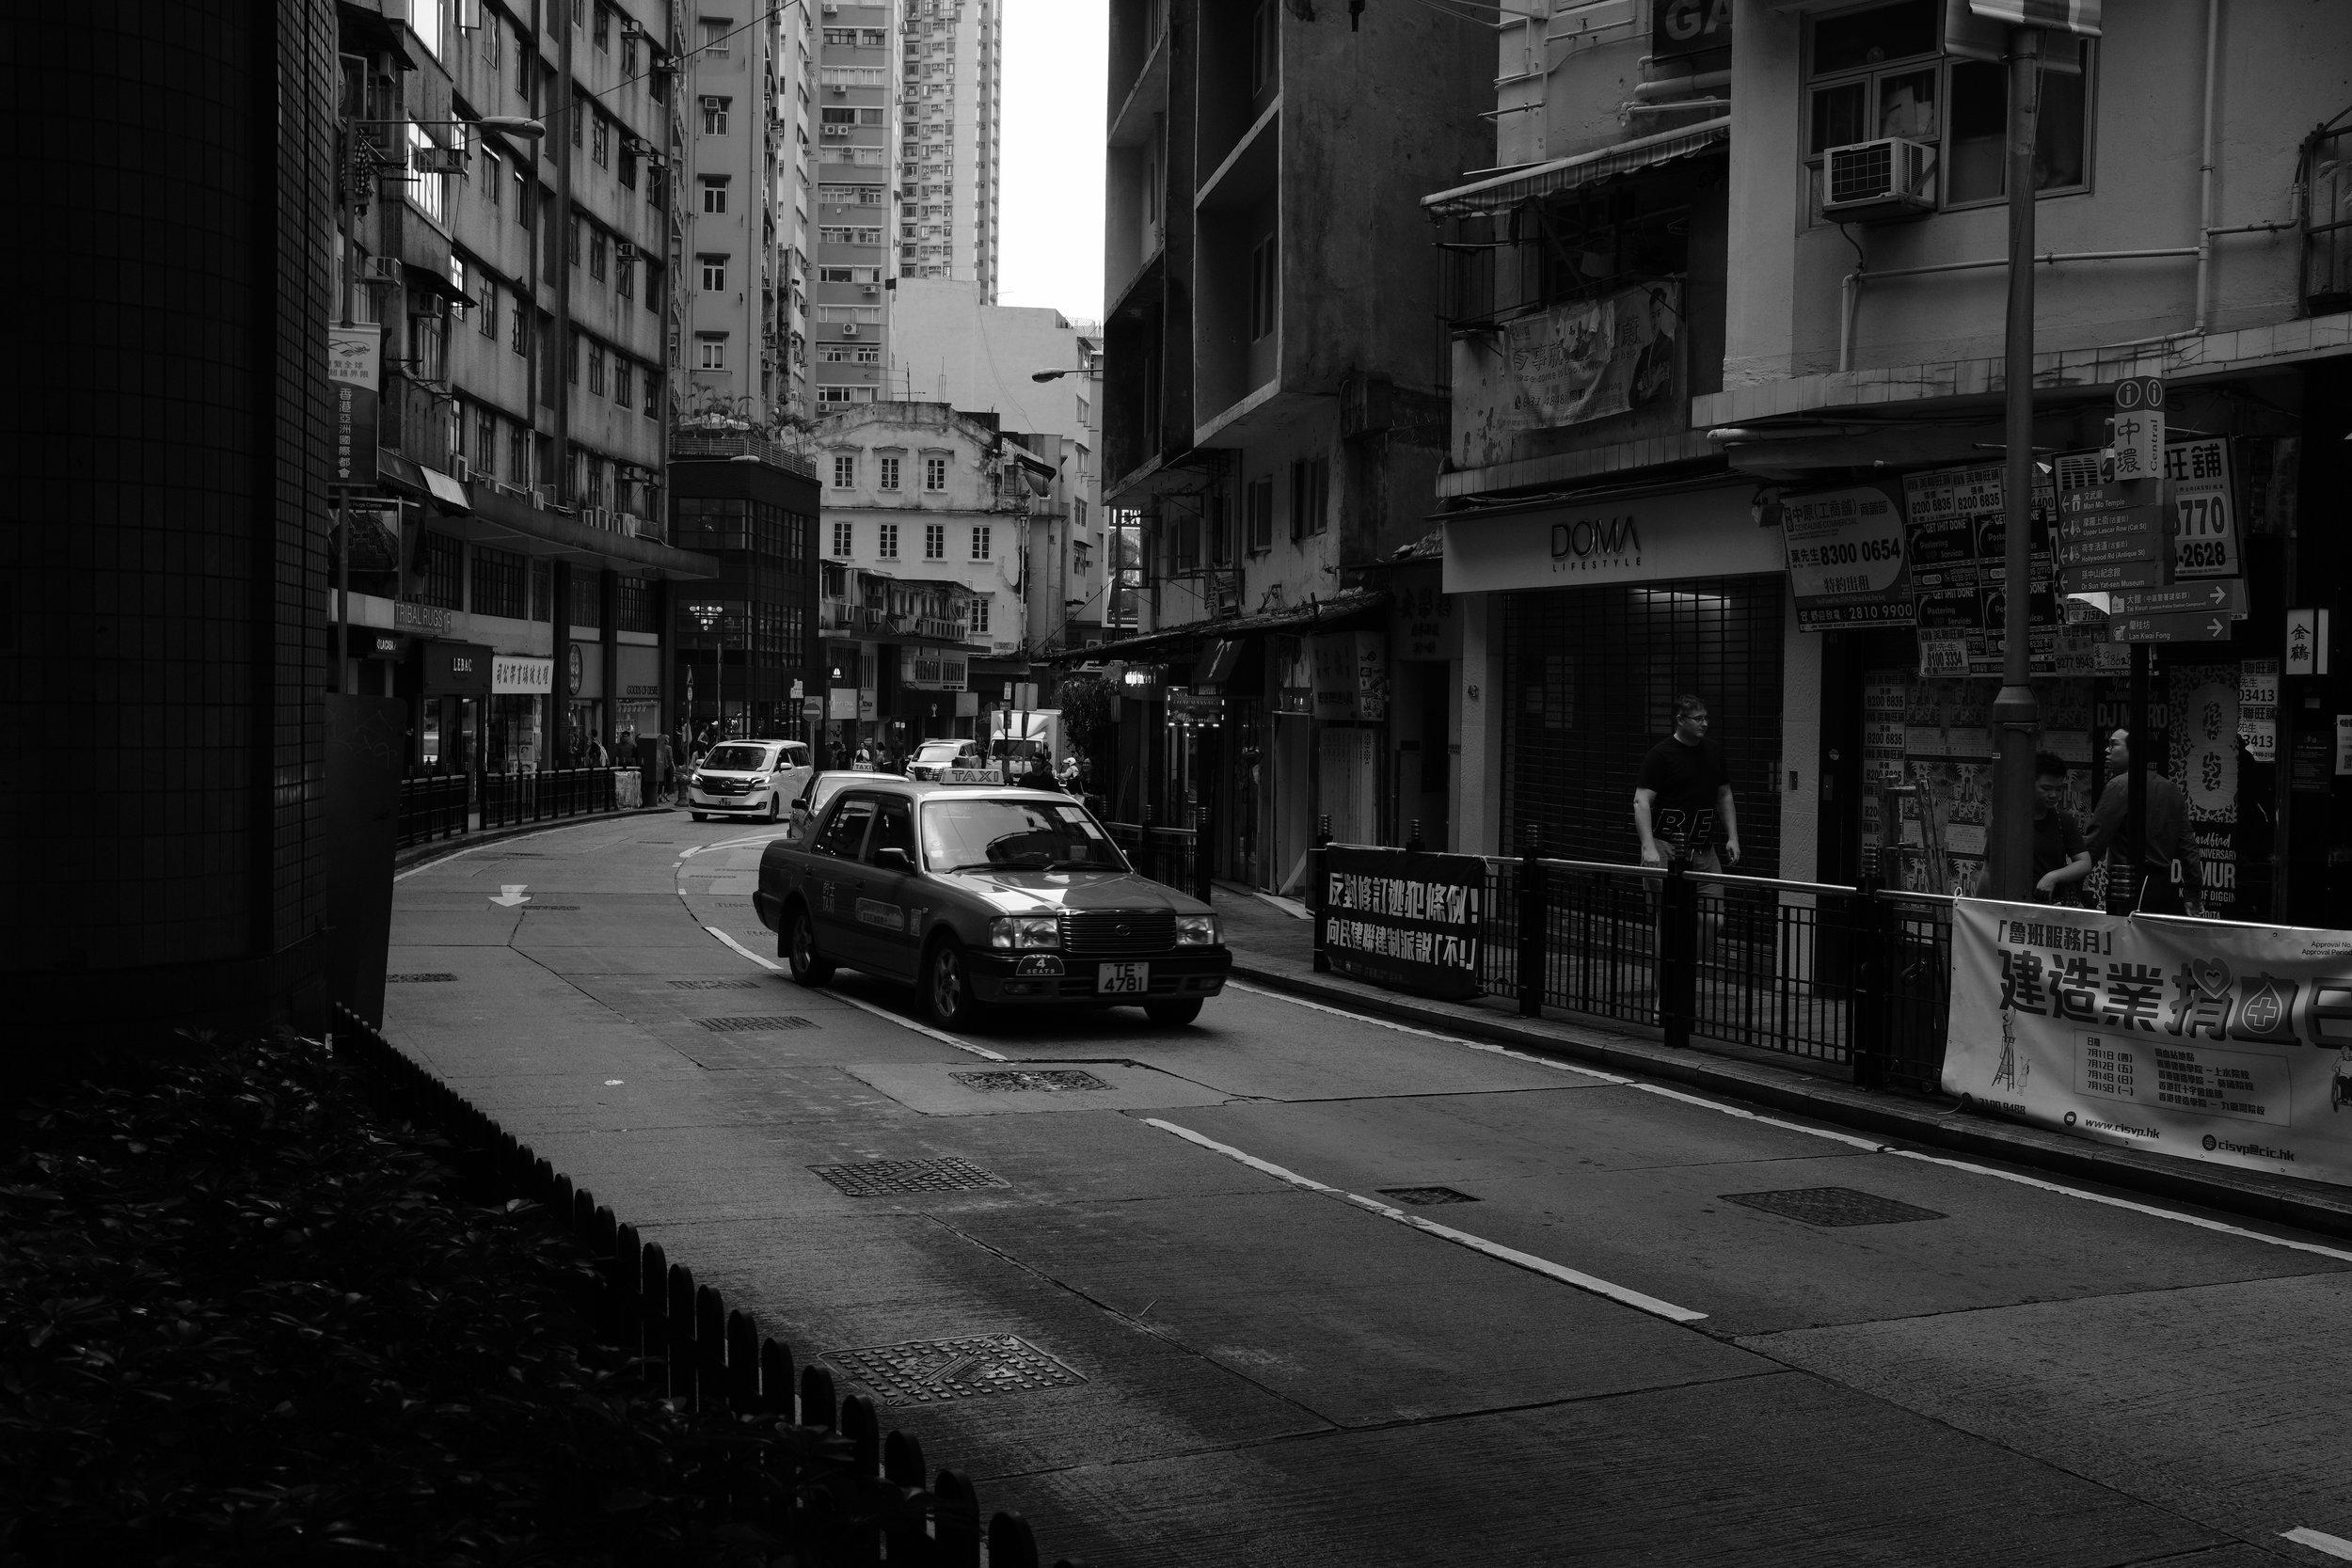 A signature Hong Kong Taxi